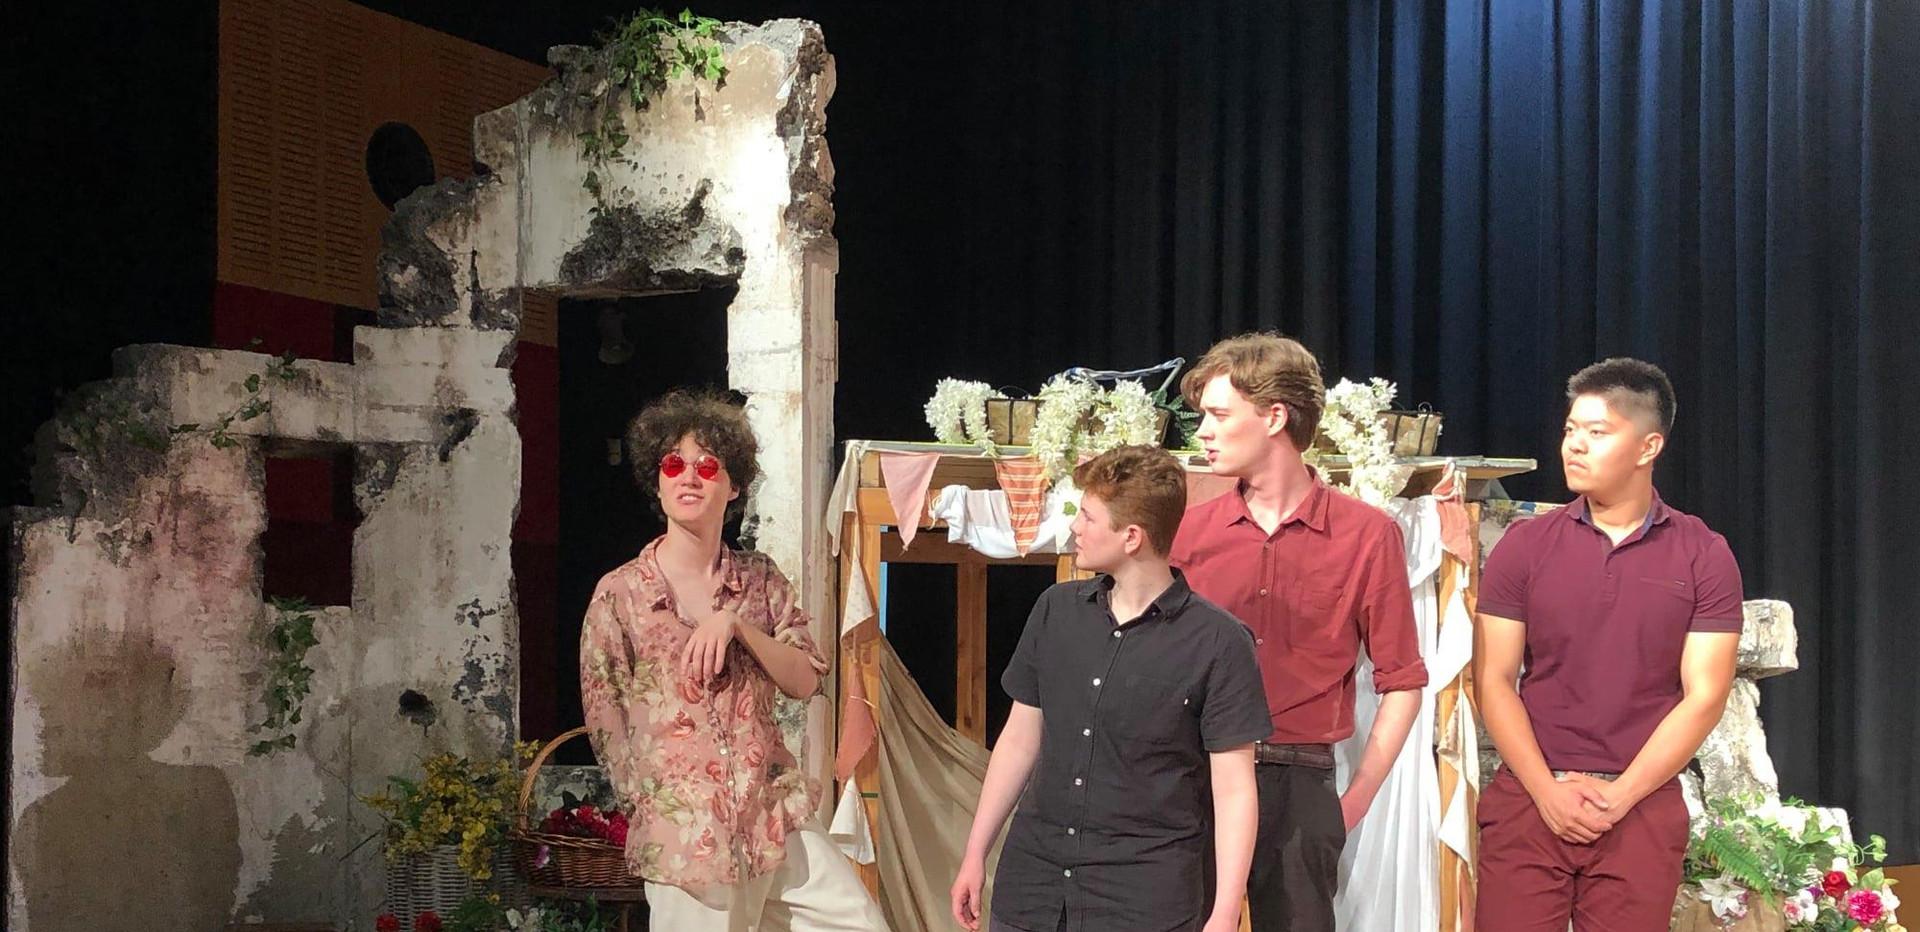 The Florist of Arden